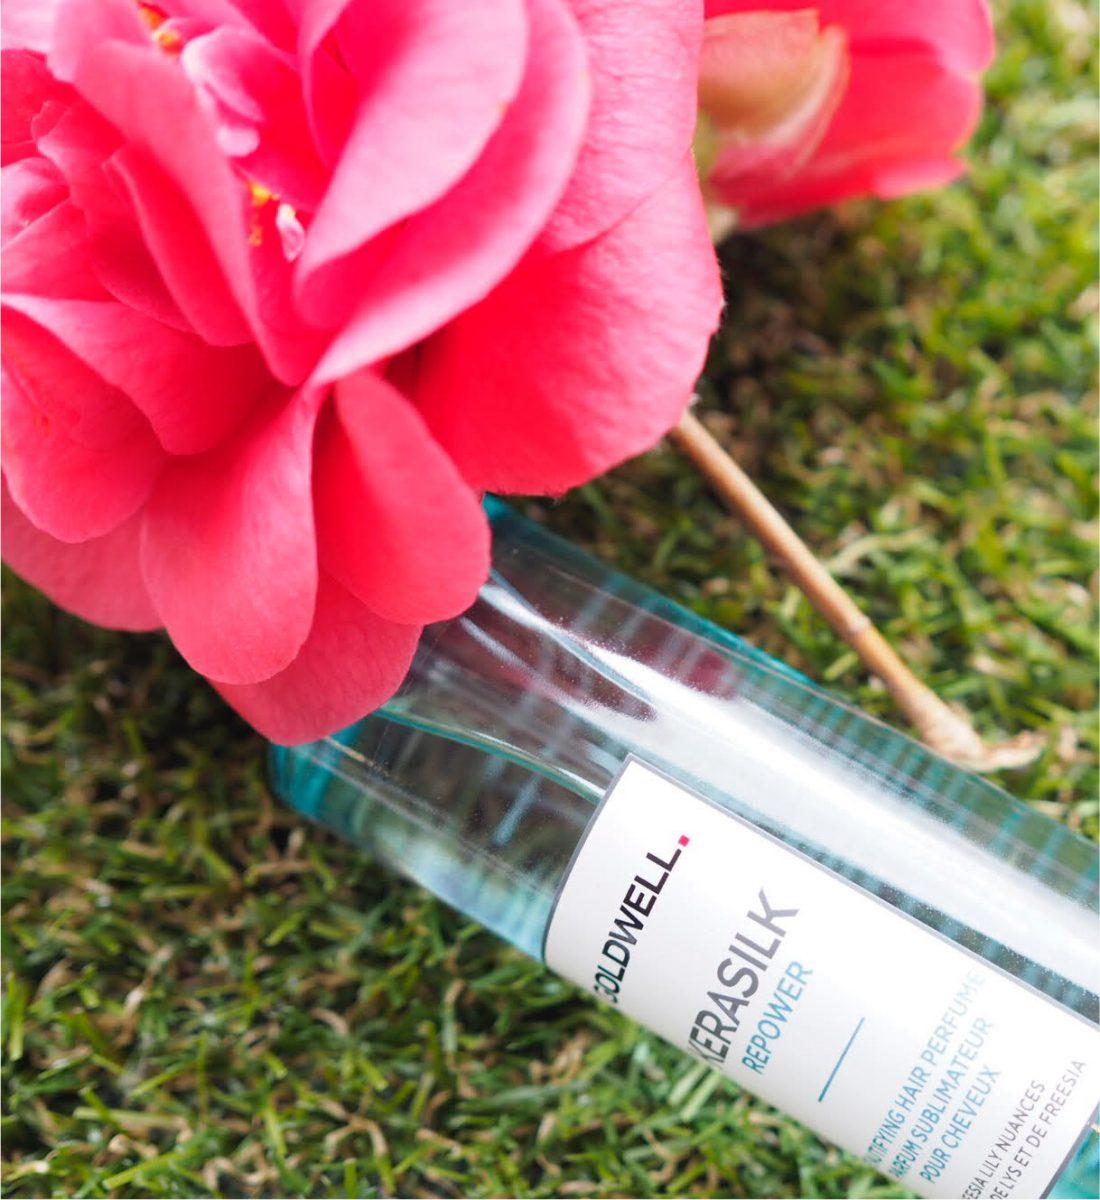 Goldwell Kerasilk Hair Fragrance / British Beauty Blogger 42